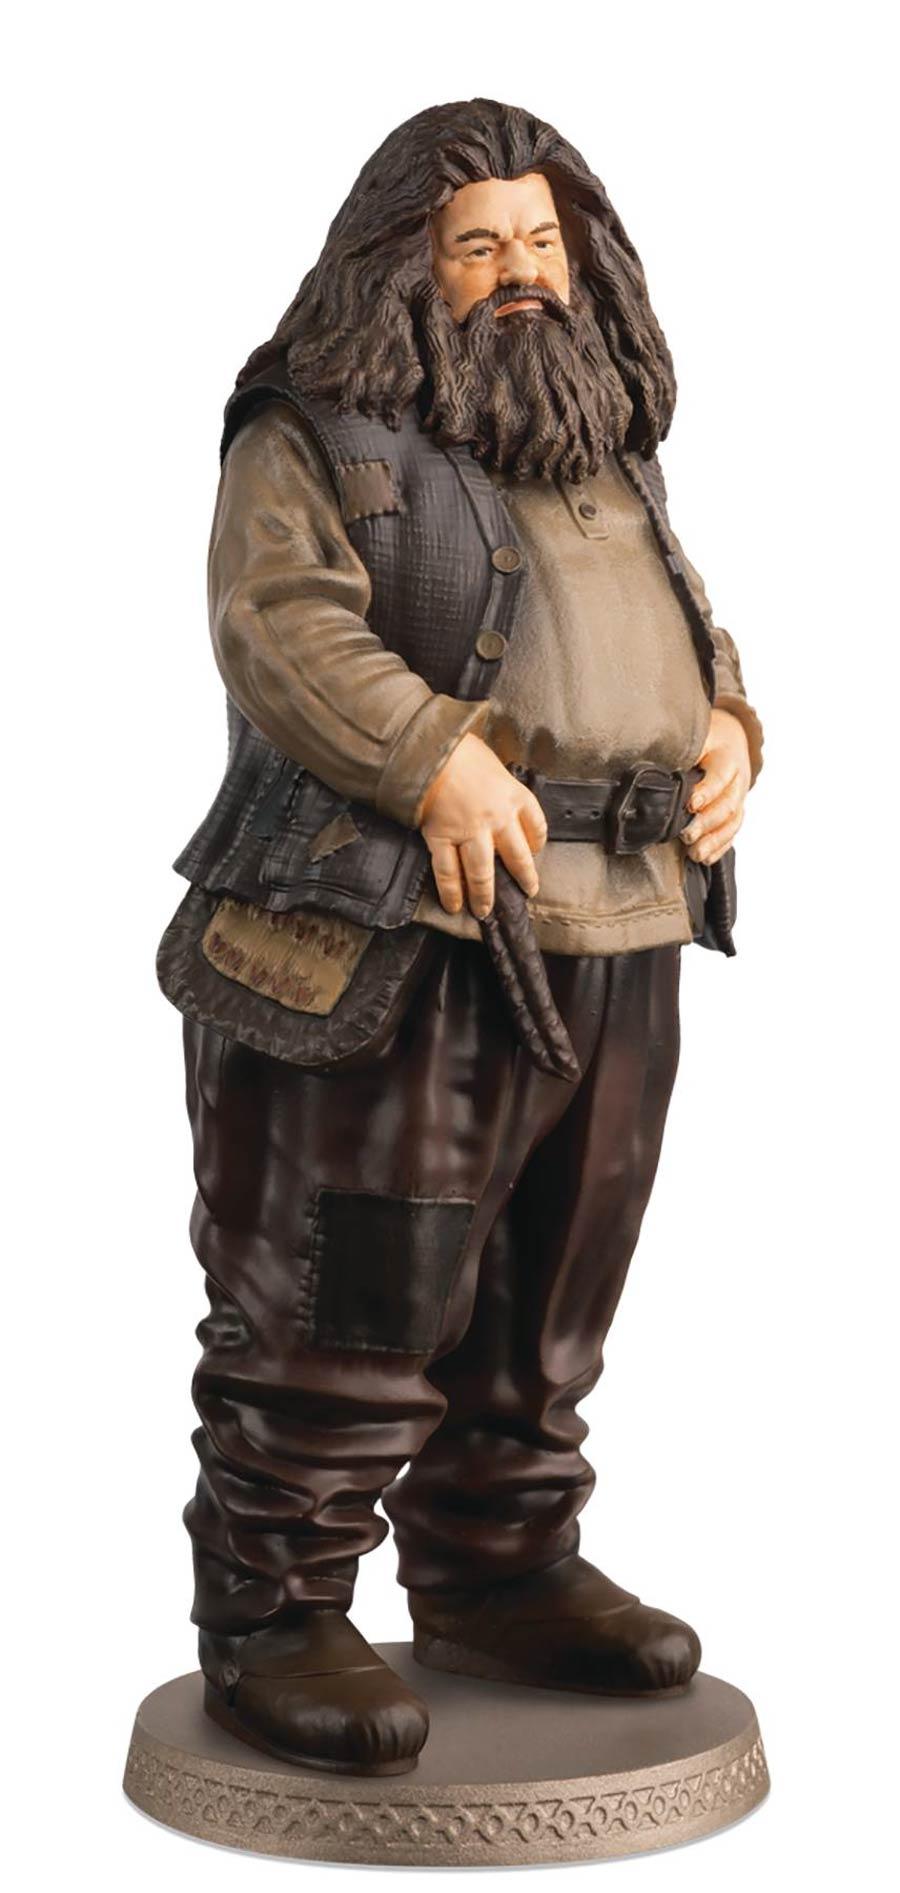 Wizarding World Figurine Collection - Hagrid